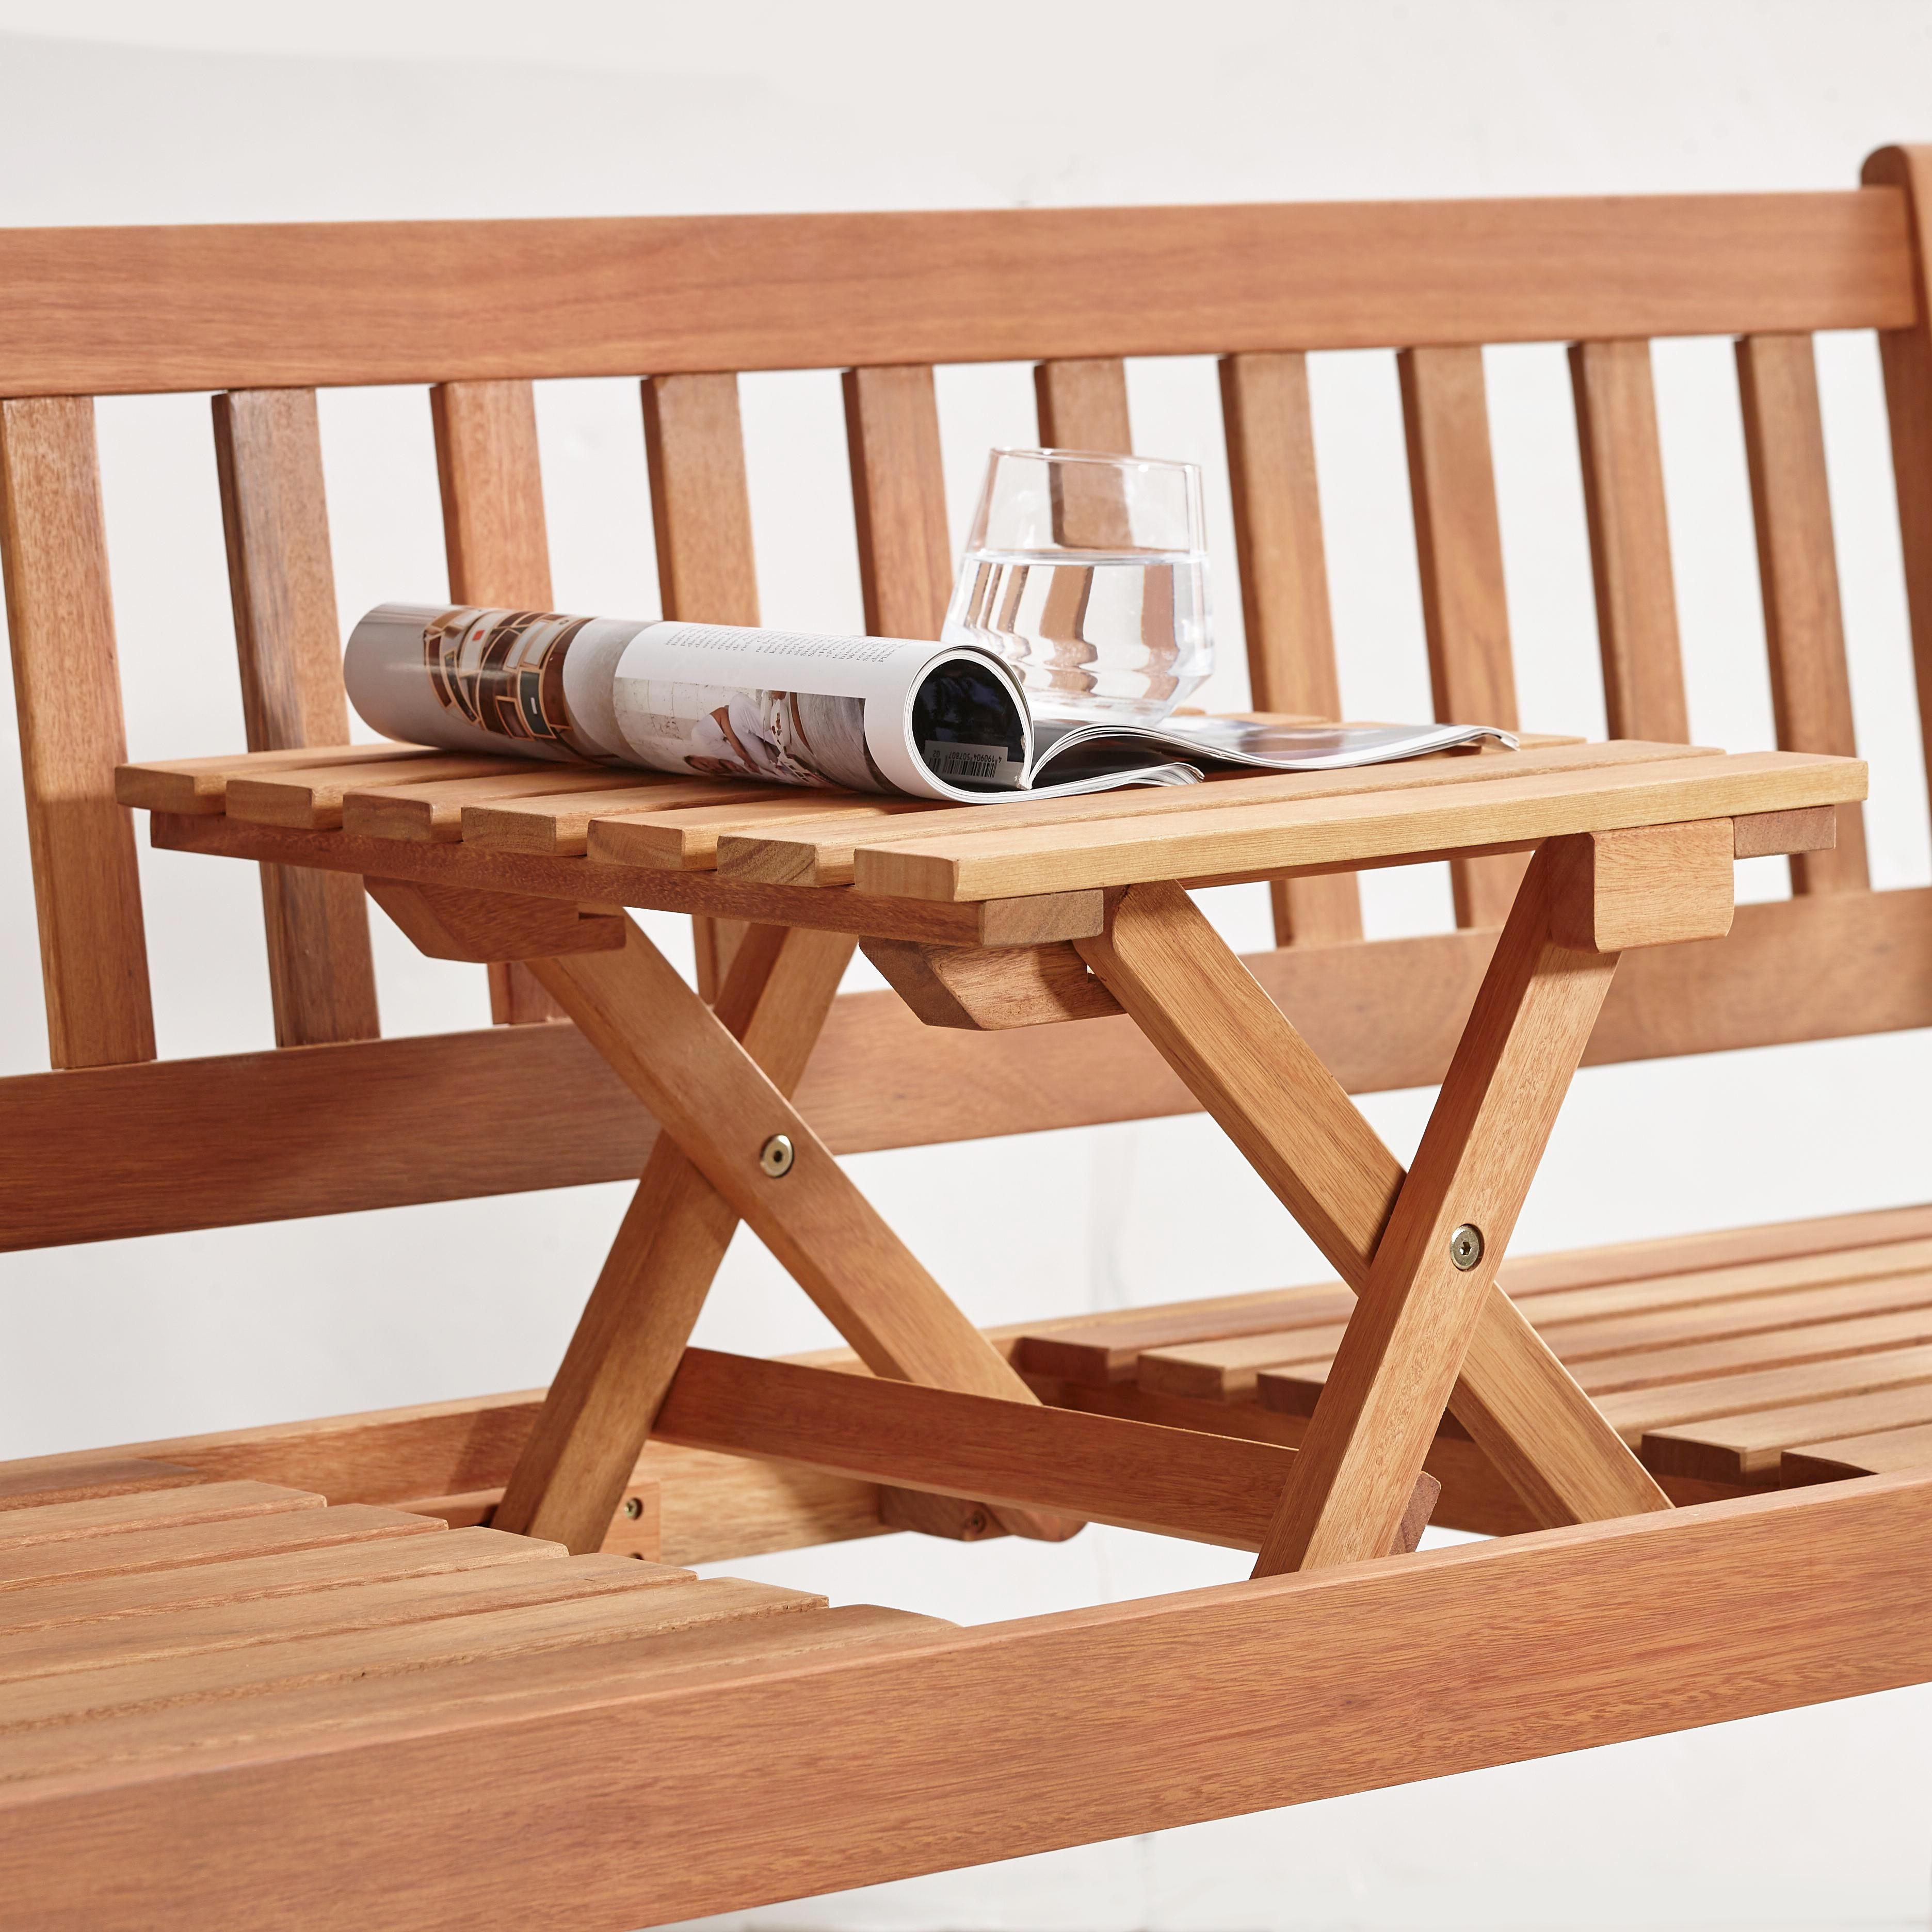 GARTENBANK Eukalyptusholz - Naturfarben, Design, Holz (159/88/60cm) - AMBIA GARDEN